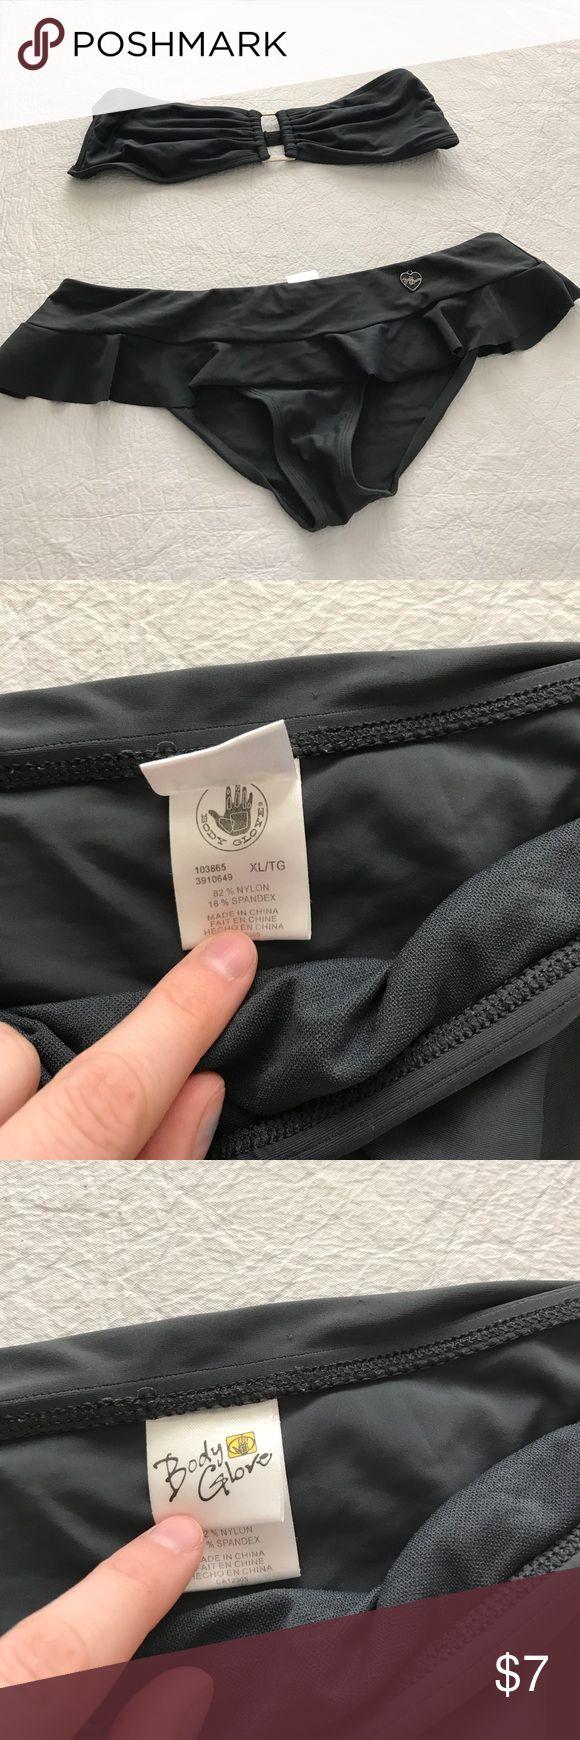 Body Glove Bikini Charcoal grey. EUC. Nylon Spandex blend. Adjustable bandeau top. (No padding). Bikini bottoms have ruffle like mini skirt look. Body Glove Swim Bikinis